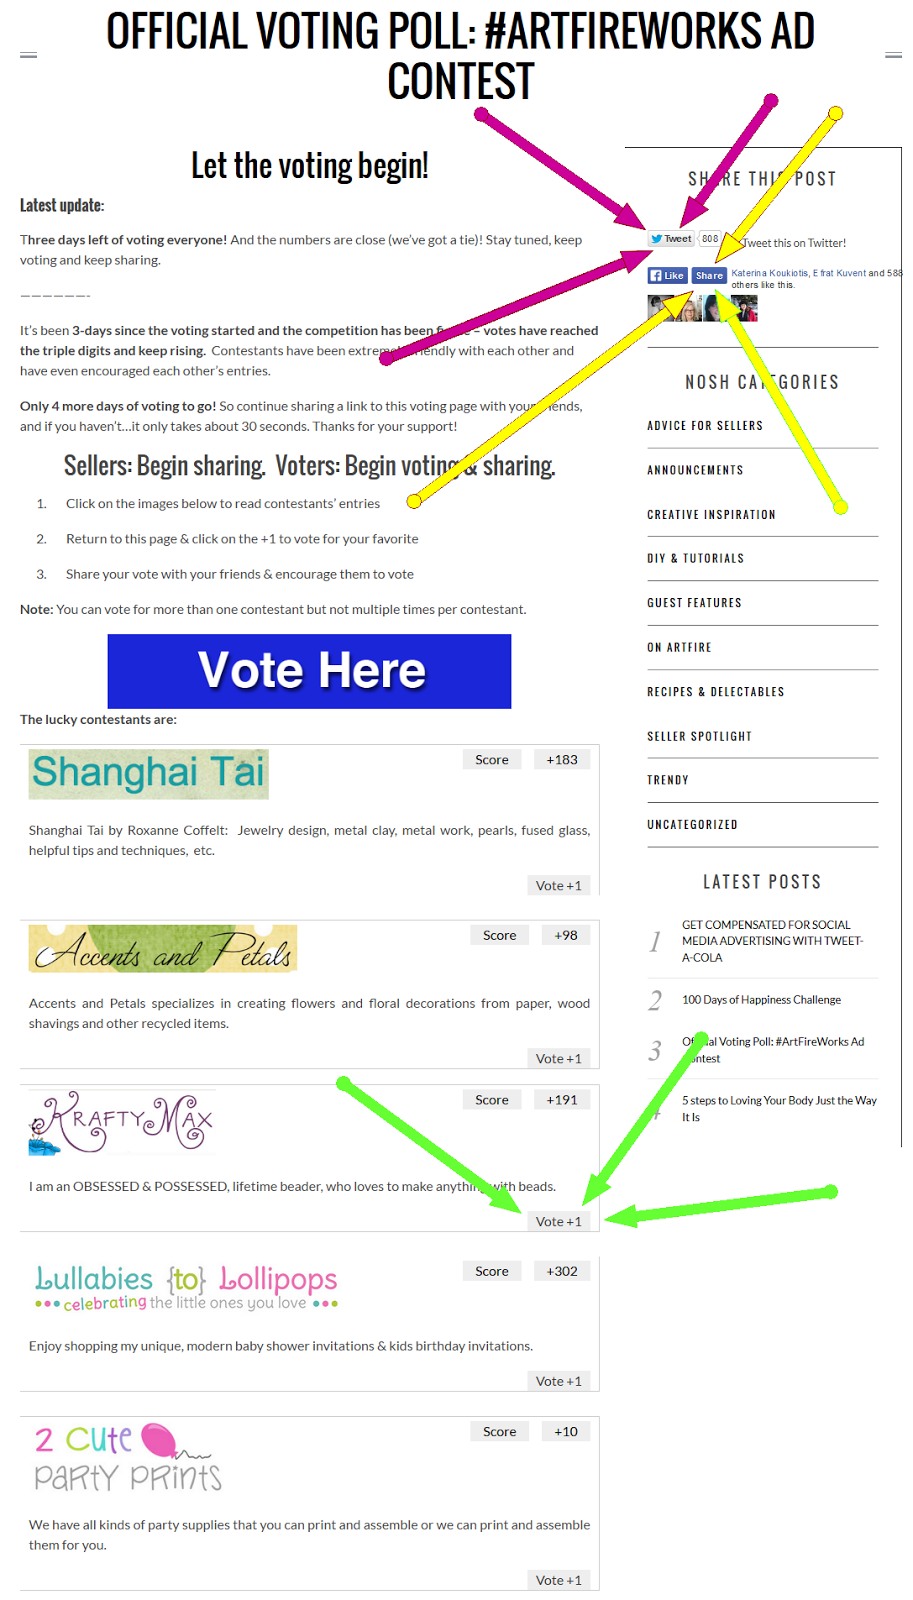 http://www.artfire.com/nosh/official-voting-poll-artfireworks-ad-contest/